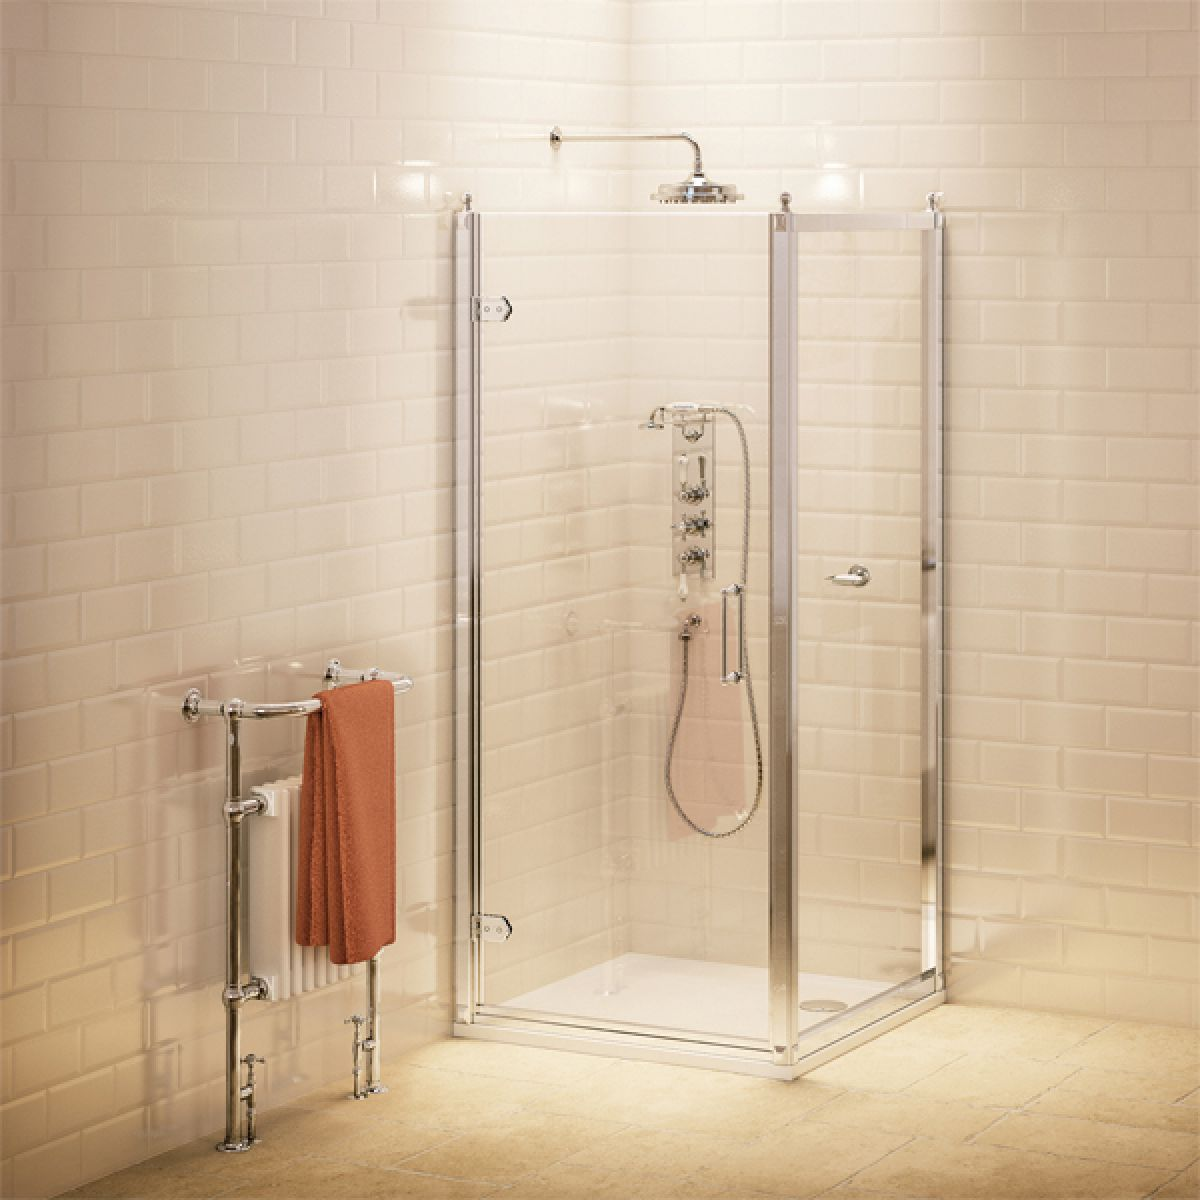 Burlington Hinged Door Shower Enclosure with Optional Side Panel